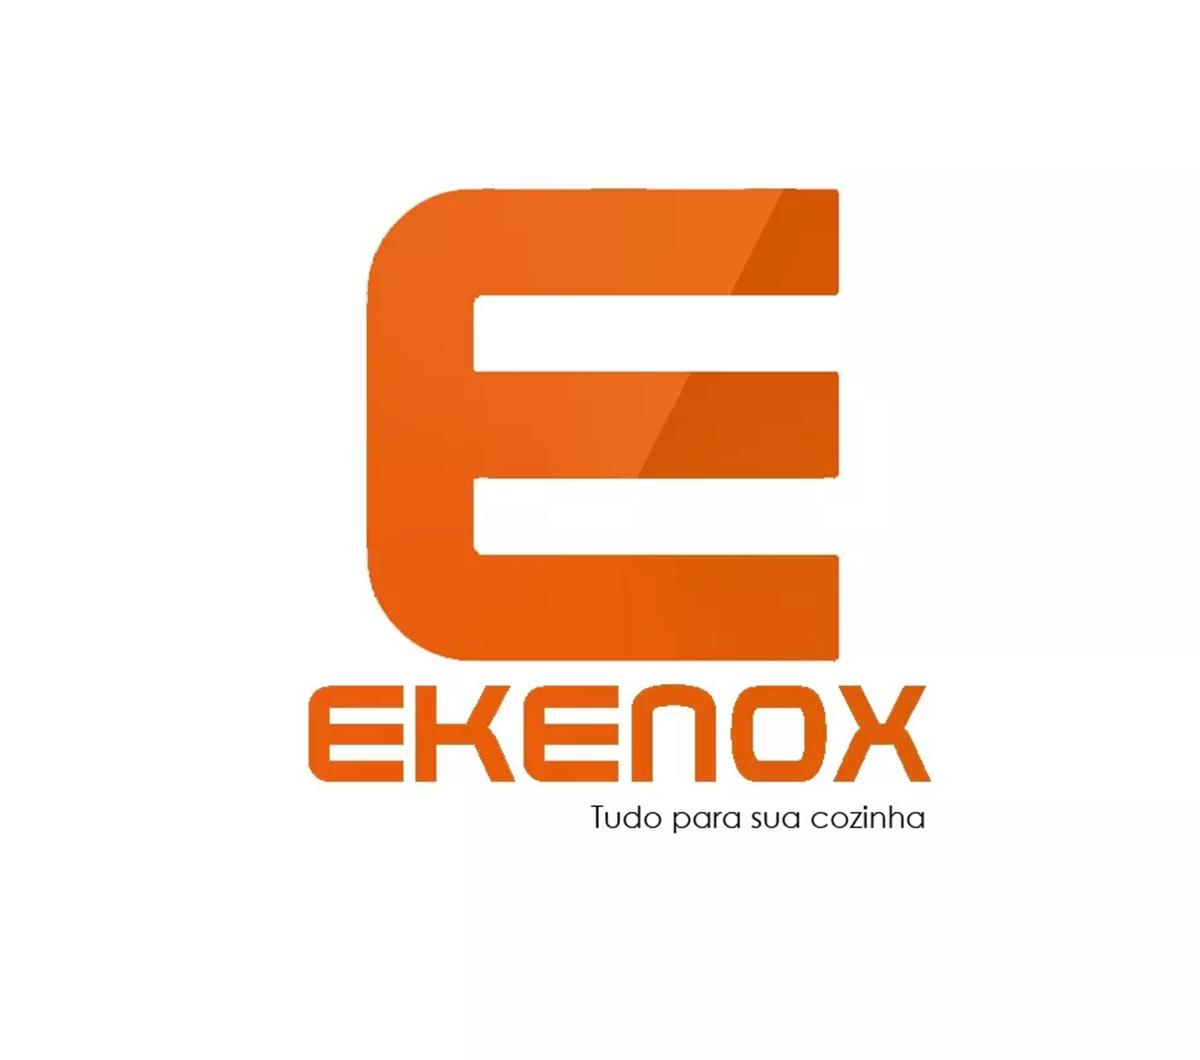 Kit 3 Forma De Bolo Redonda Antiaderente Fundo Removível  - EKENOX- Equipamentos Industriais